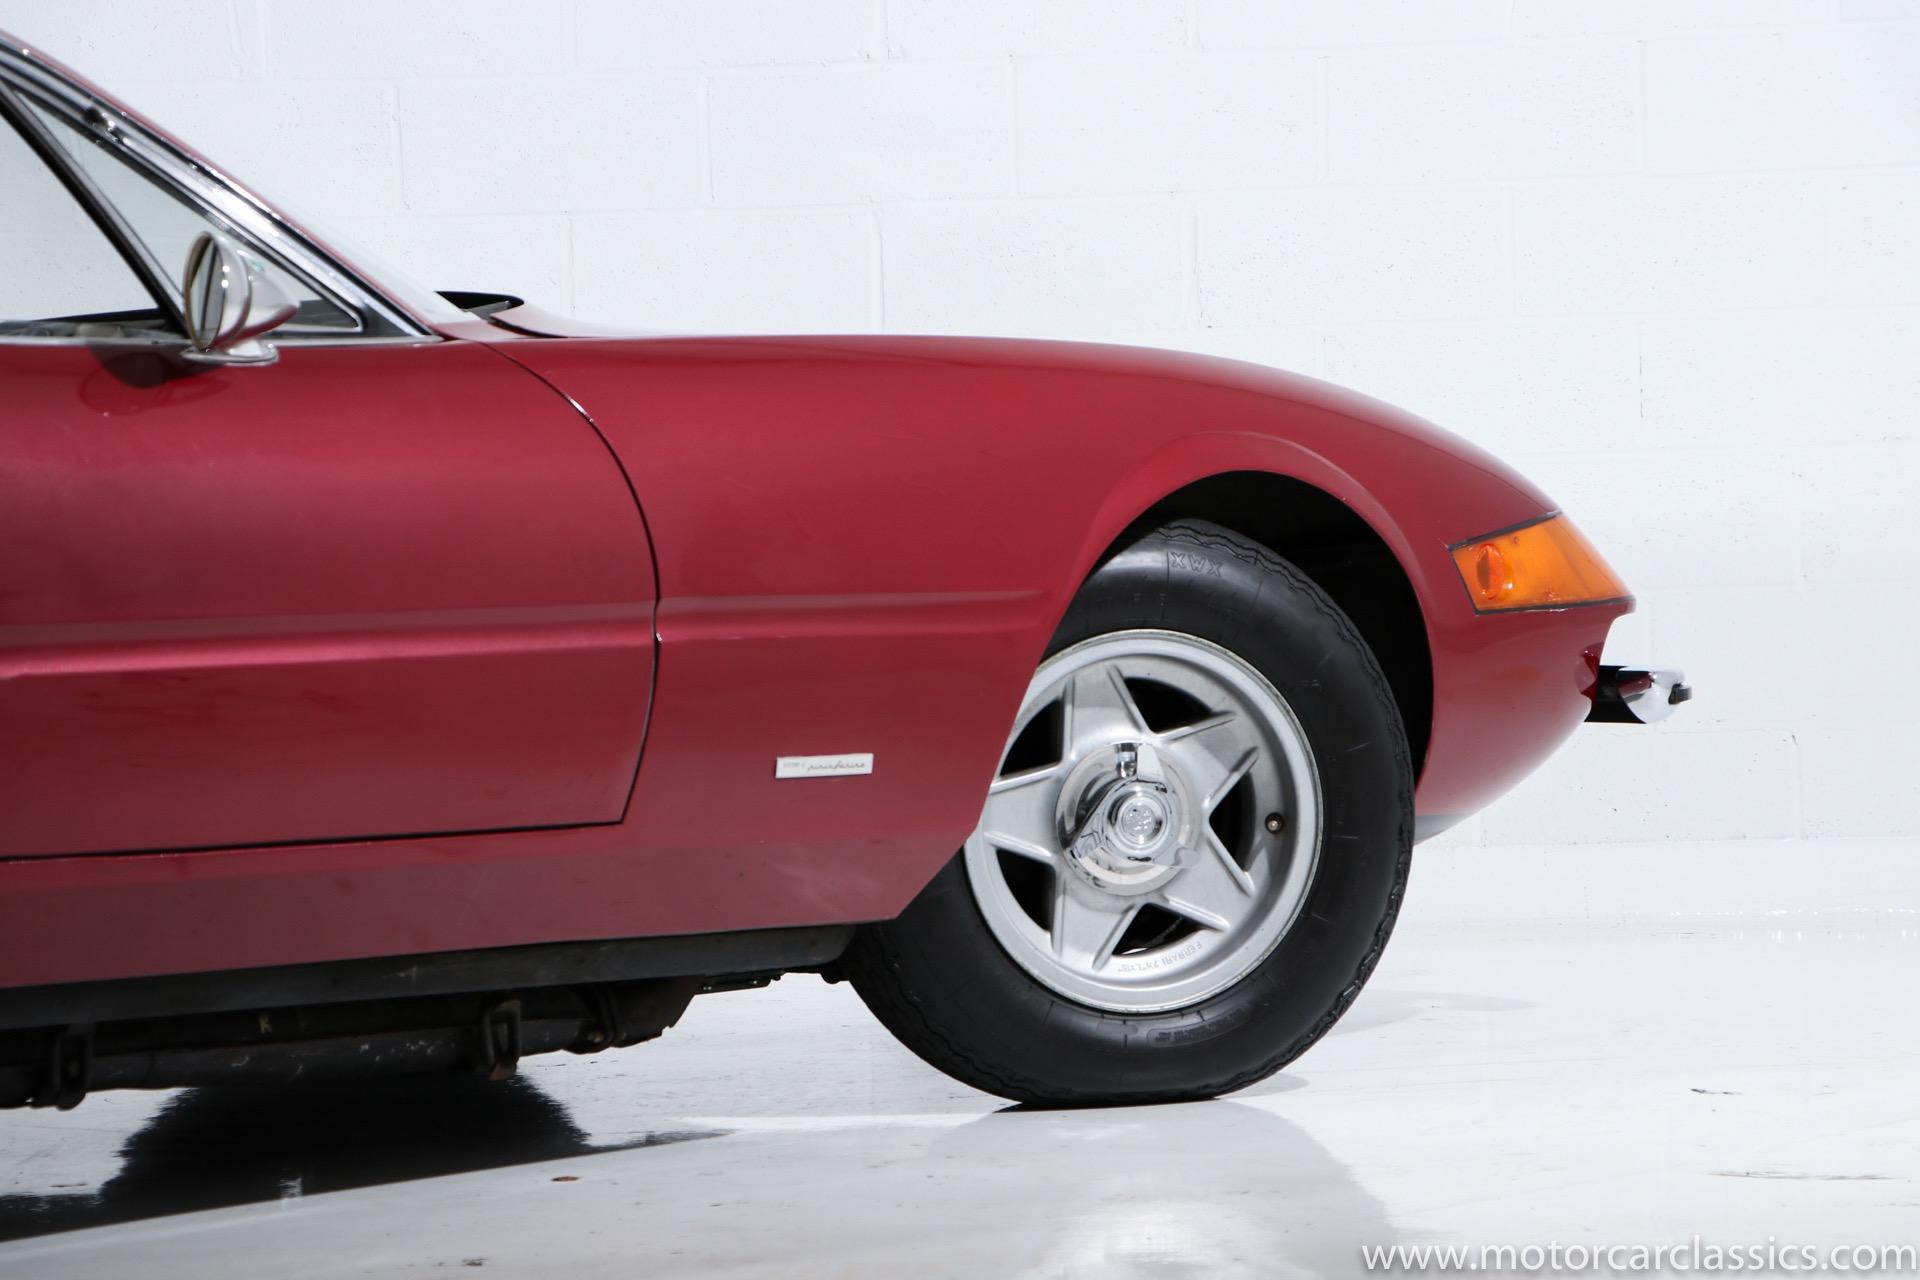 1973 Ferrari 365 GTB/4 Daytona Coupe RWD